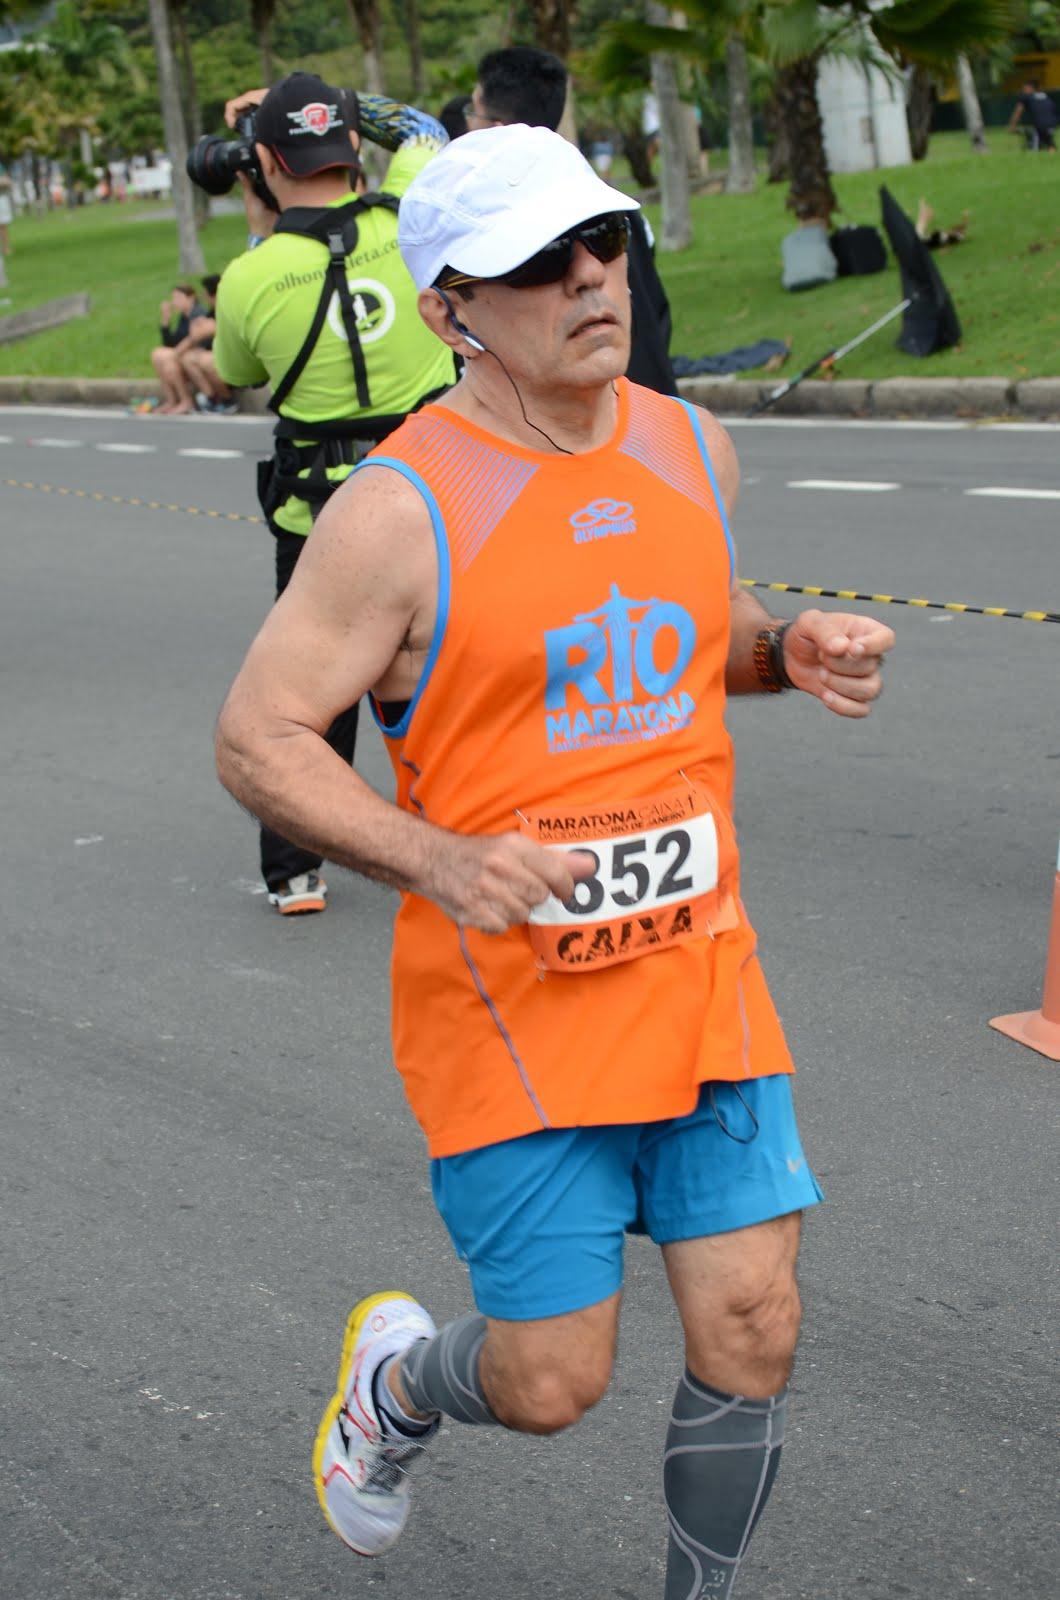 Maratona do Rio 2015